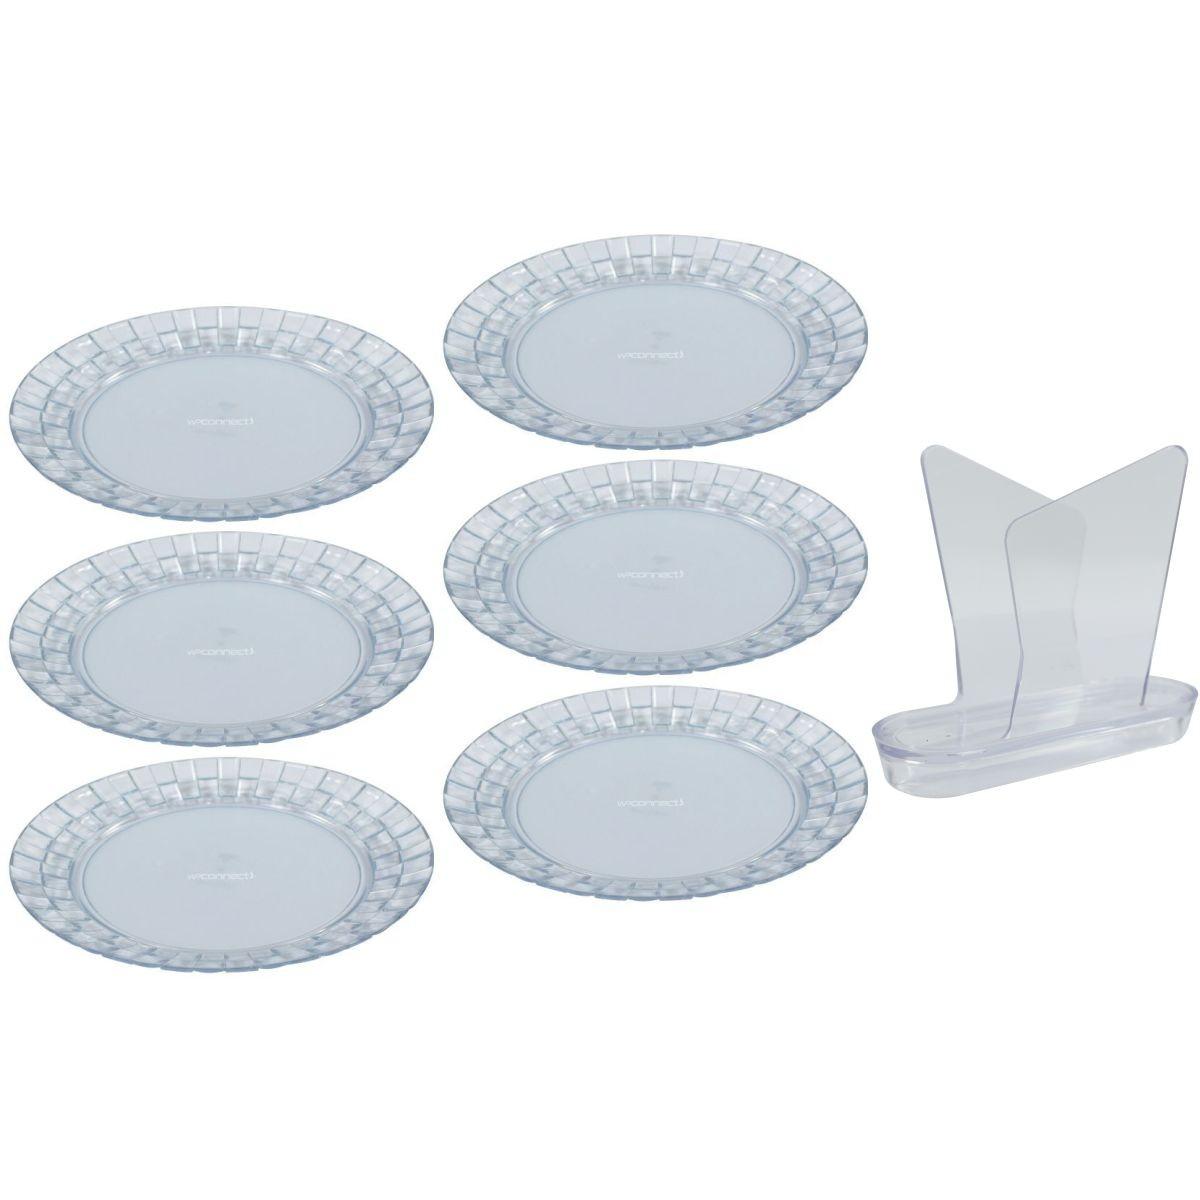 Conjunto de Pratos Rasos 6 Peças Porta Guardanapos Jantar